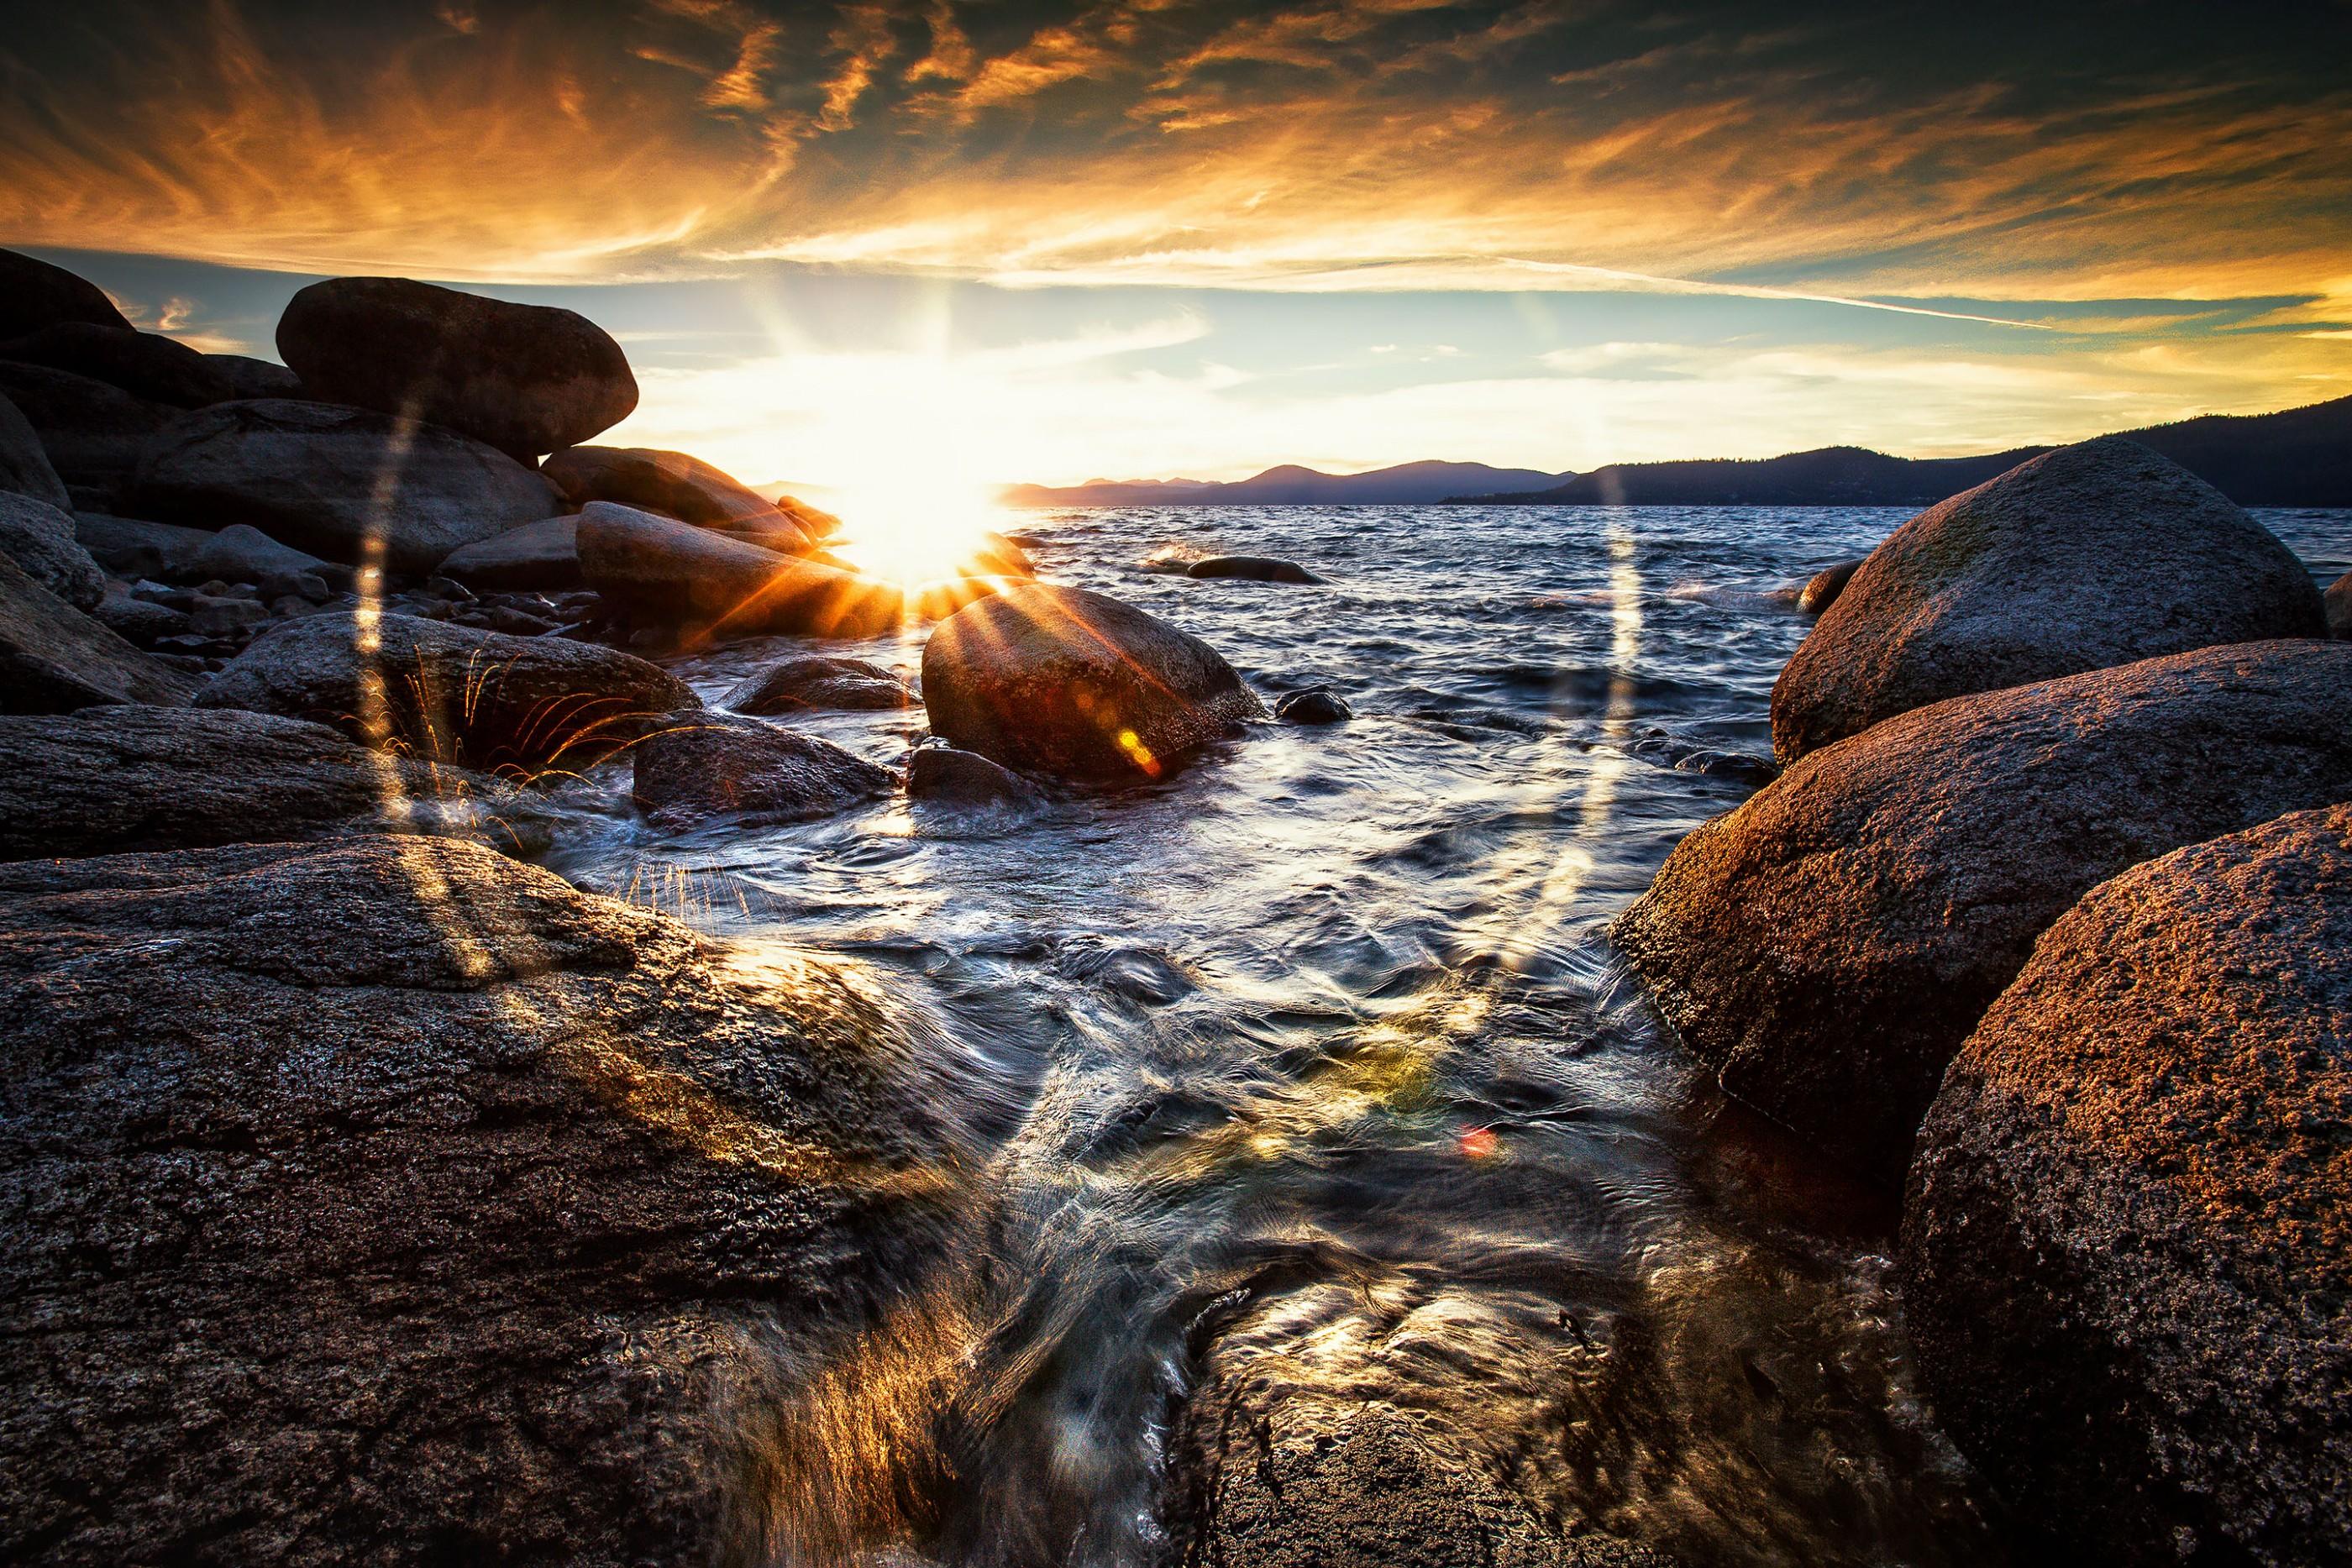 tahoe-sunset-flare-ash-newell